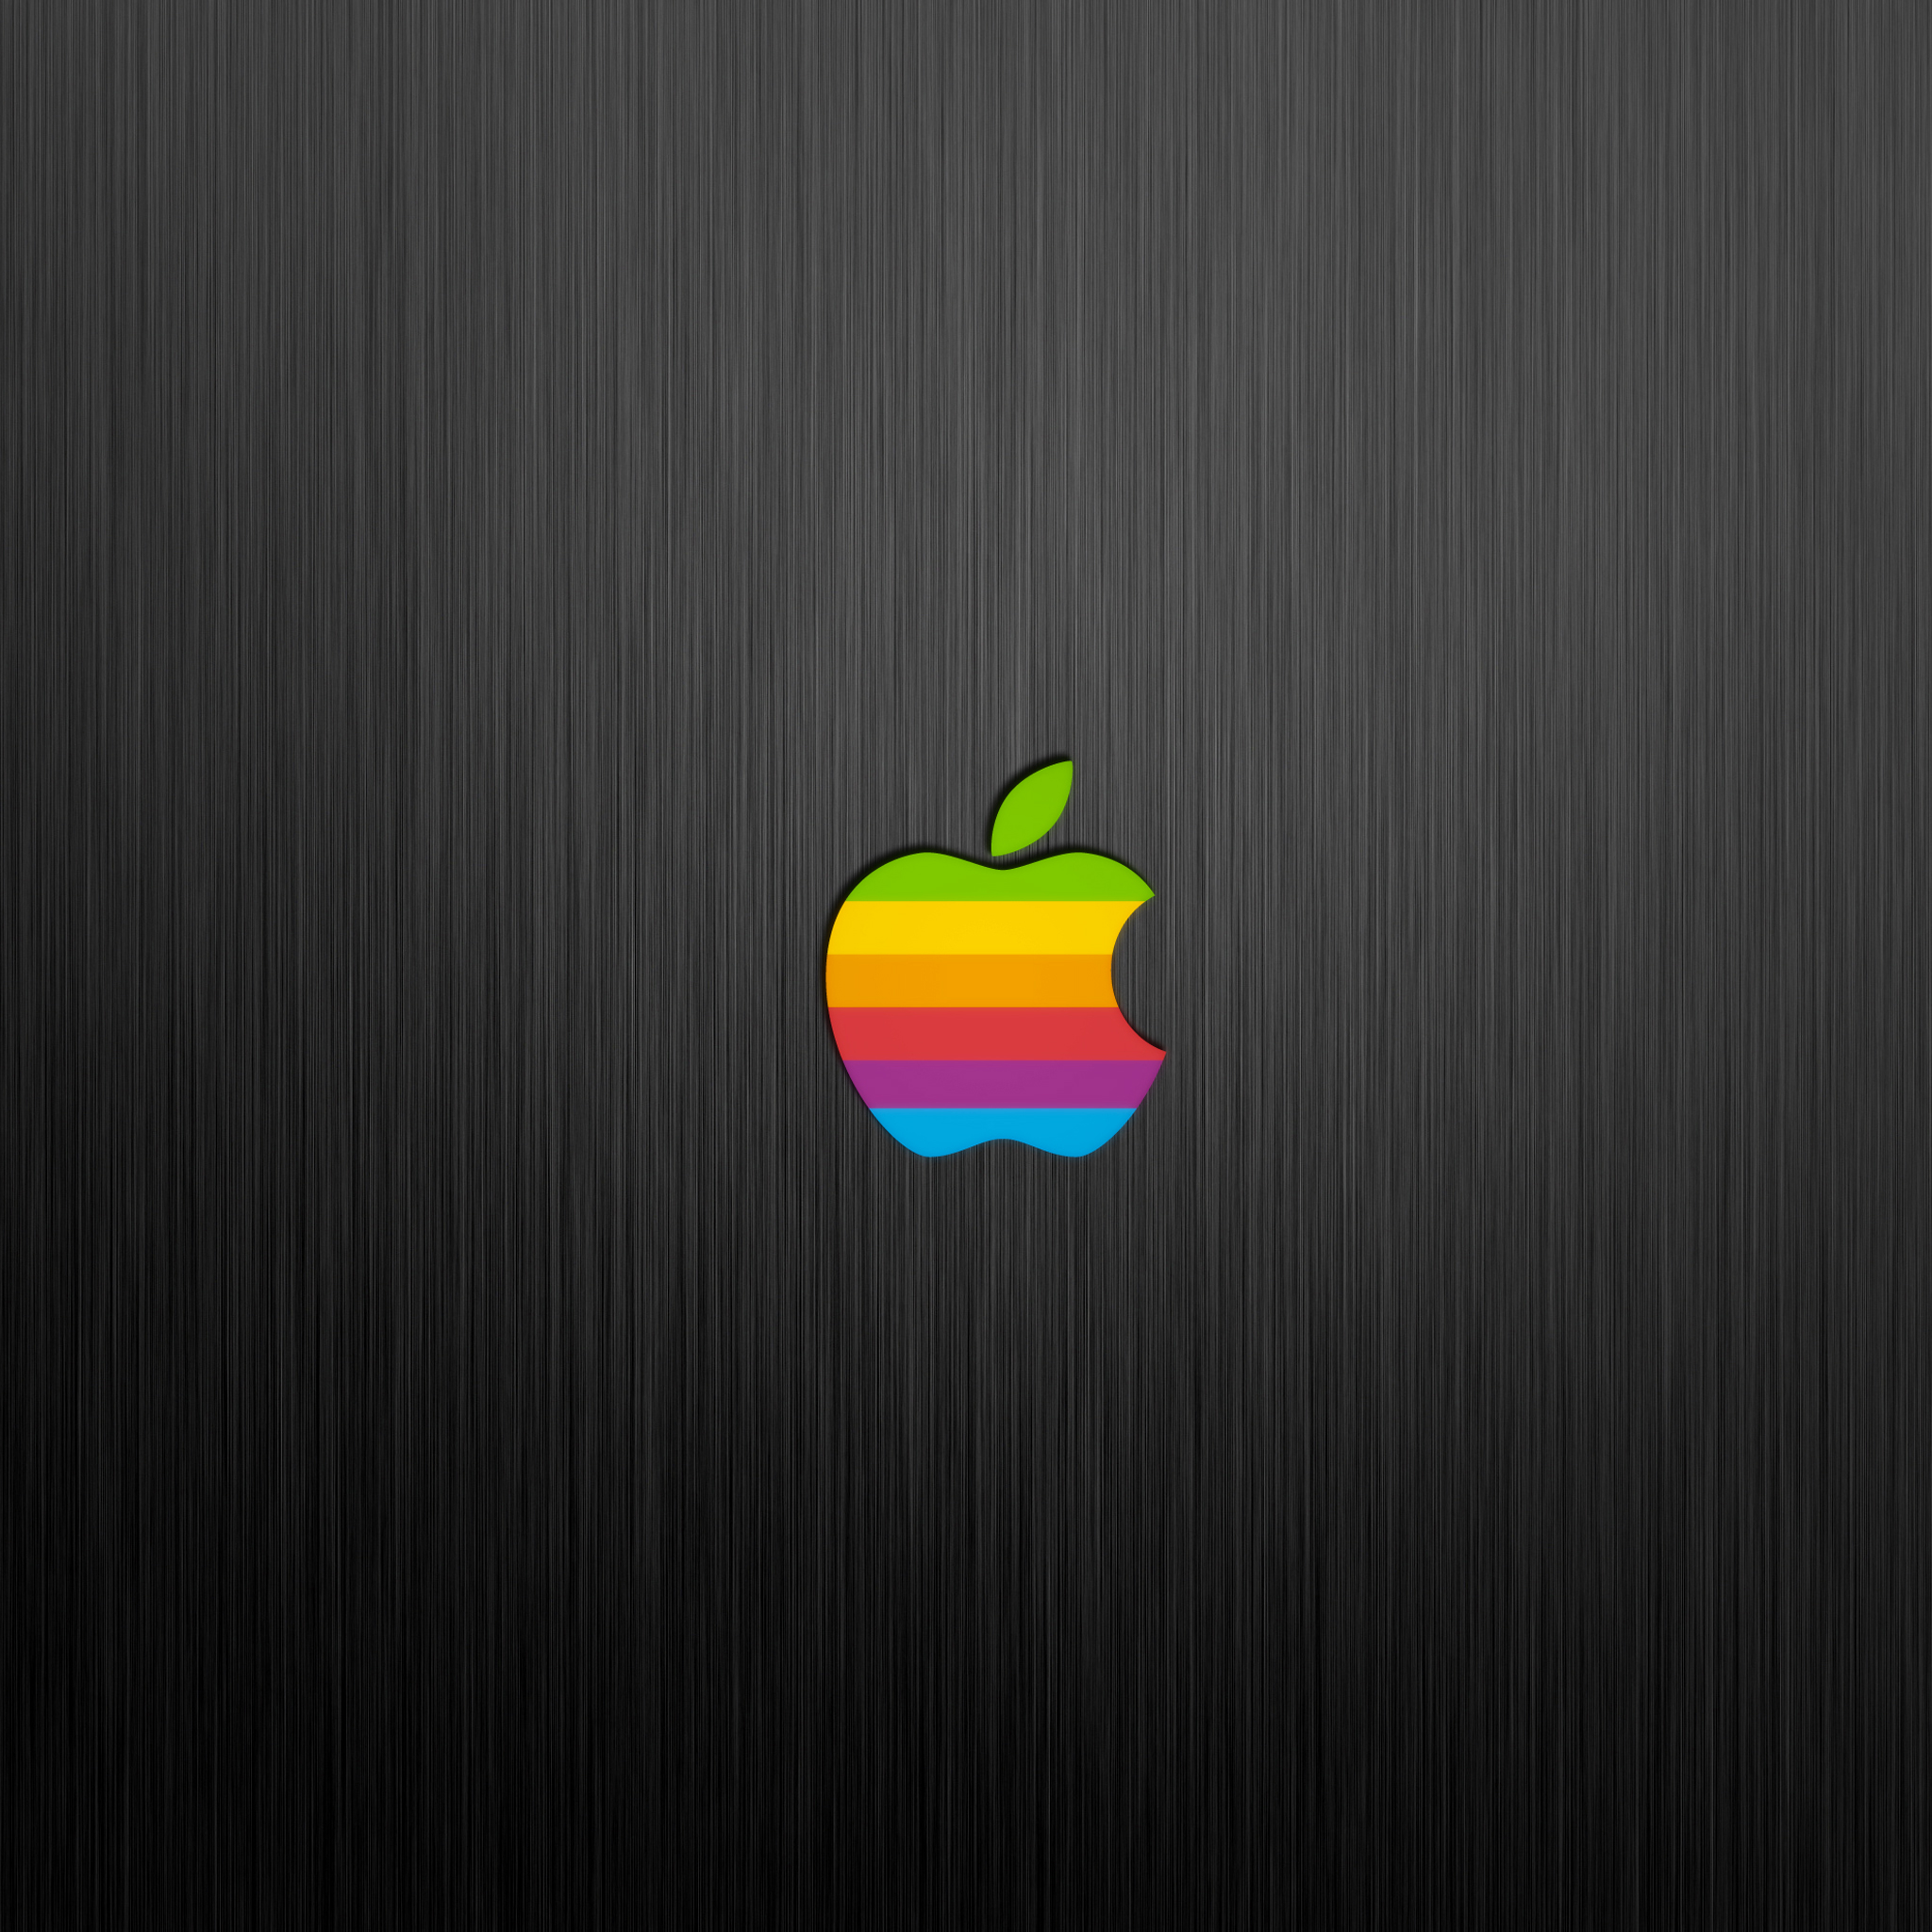 Apple Classic - iPad Retina Wallpaper for iPhone X, 8, 7 ...